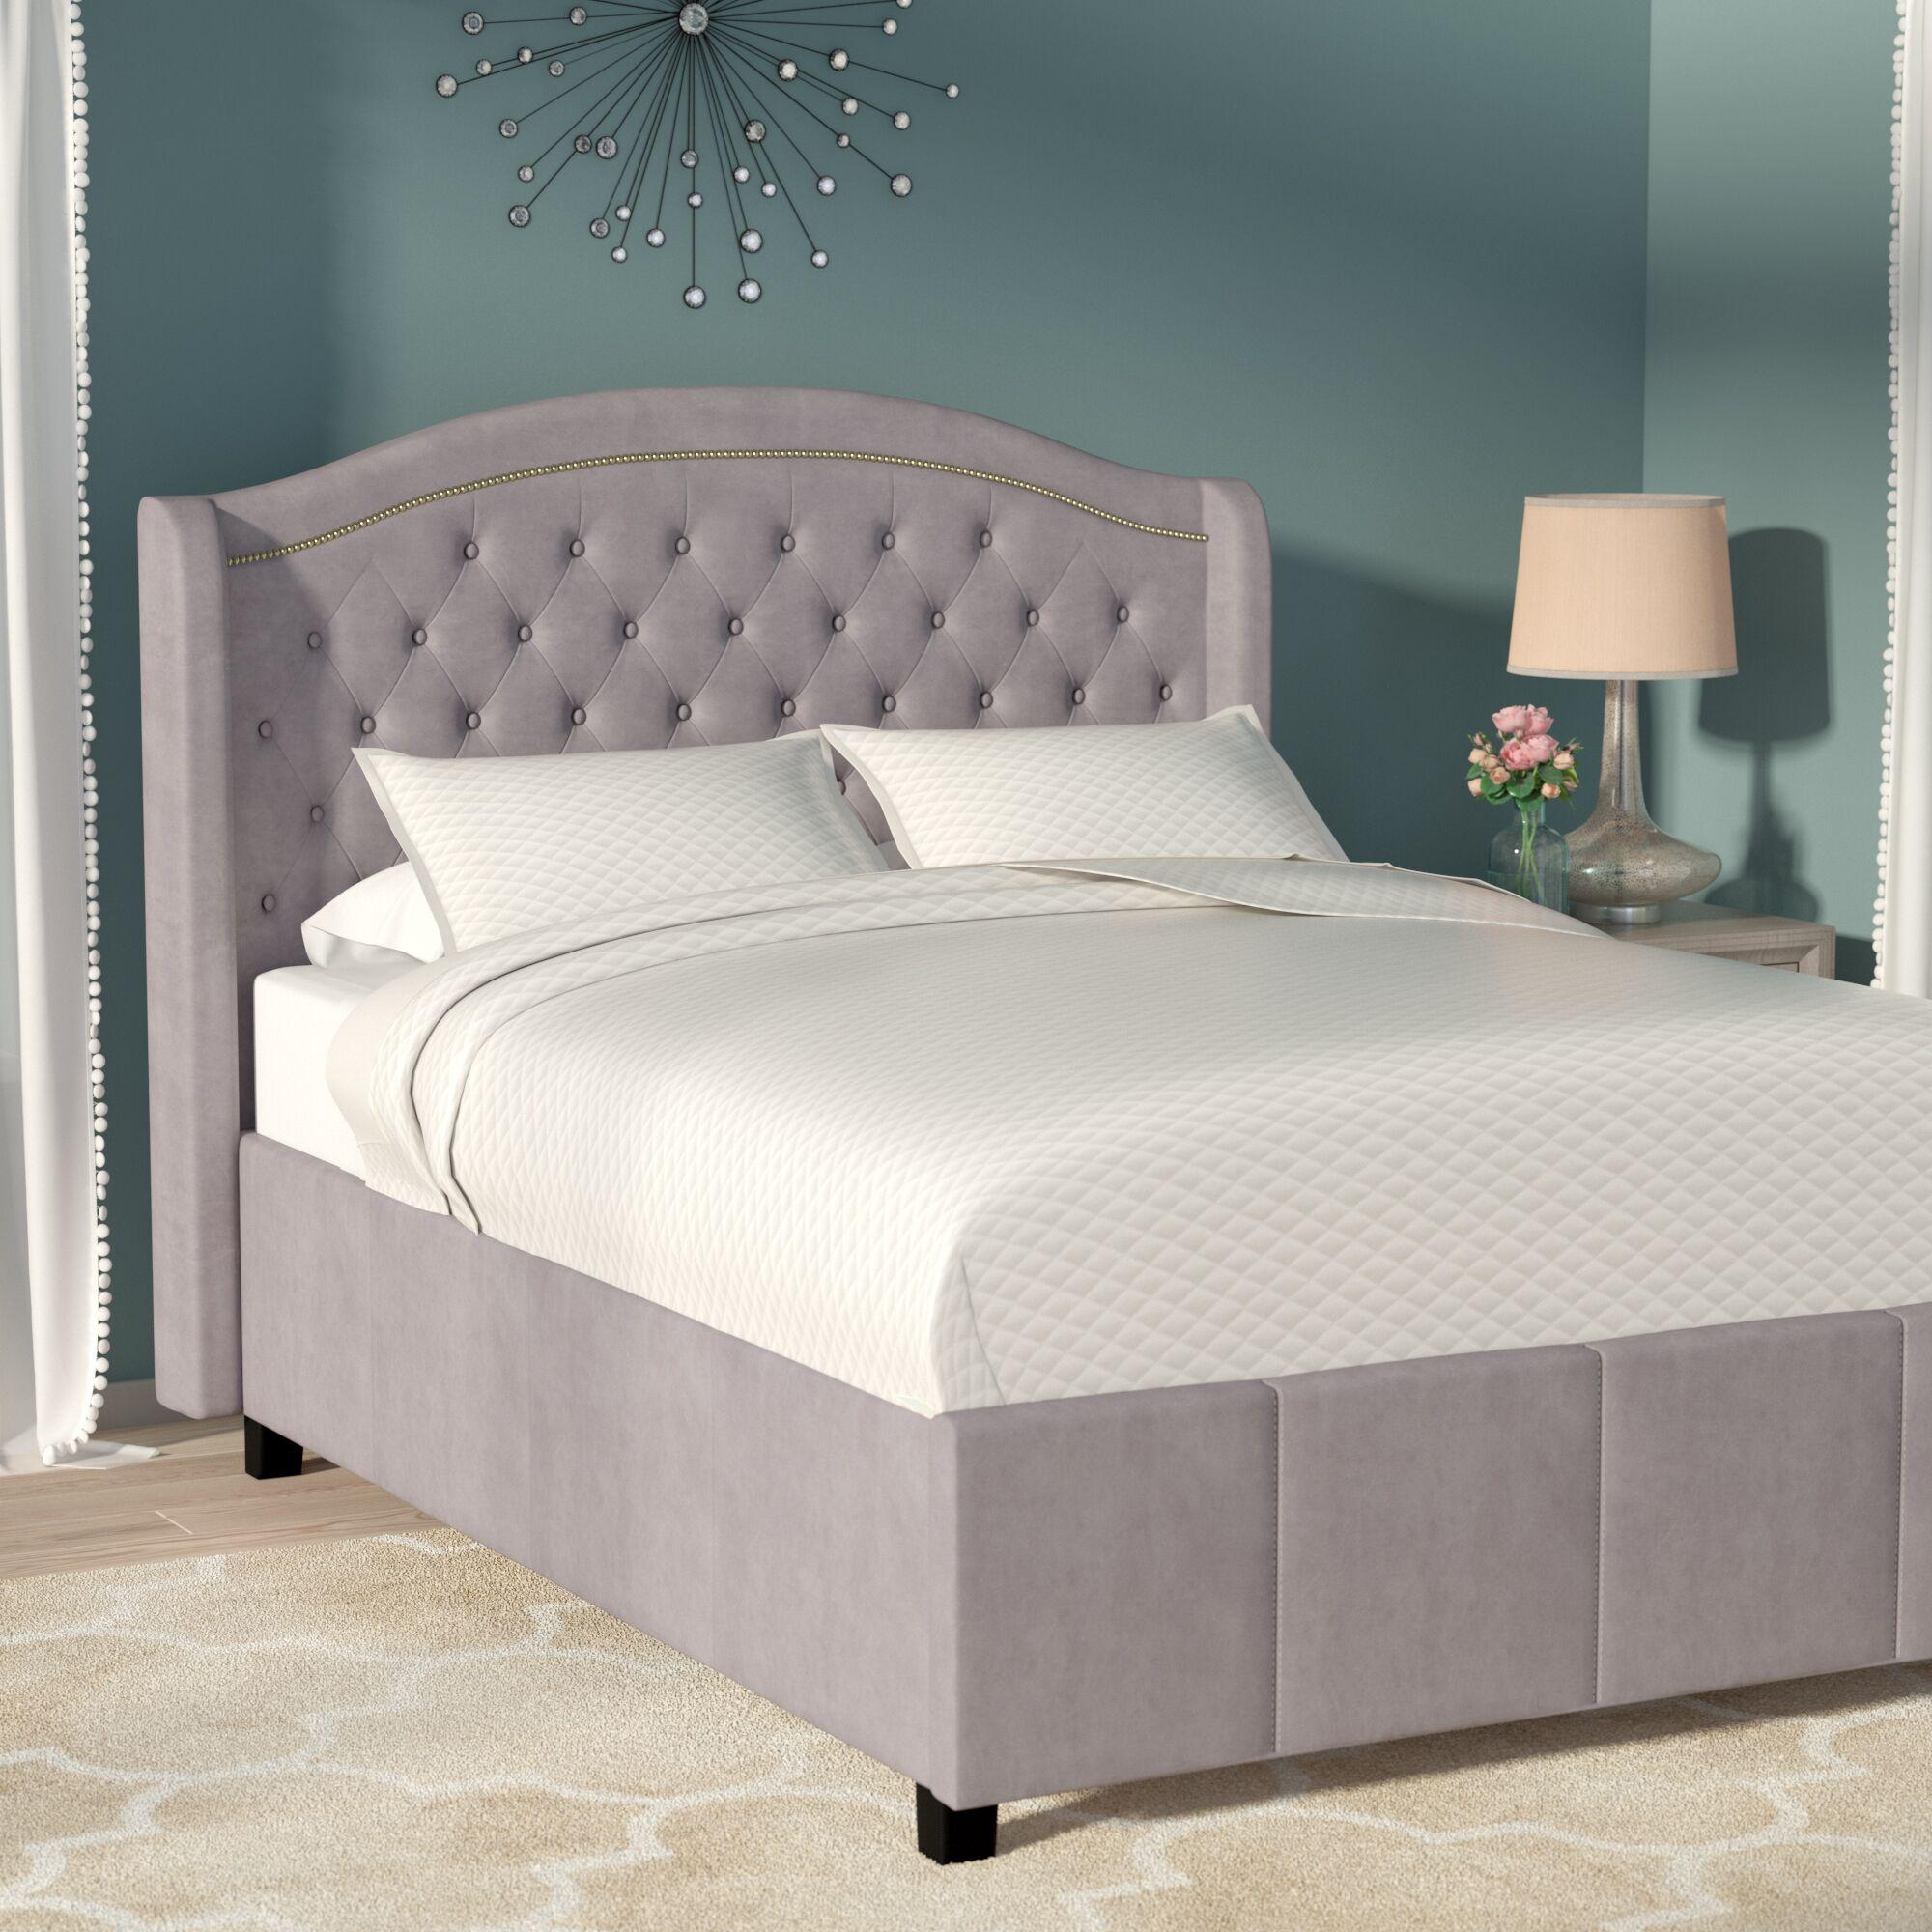 Adao Upholstered Platform Bed Size: Full